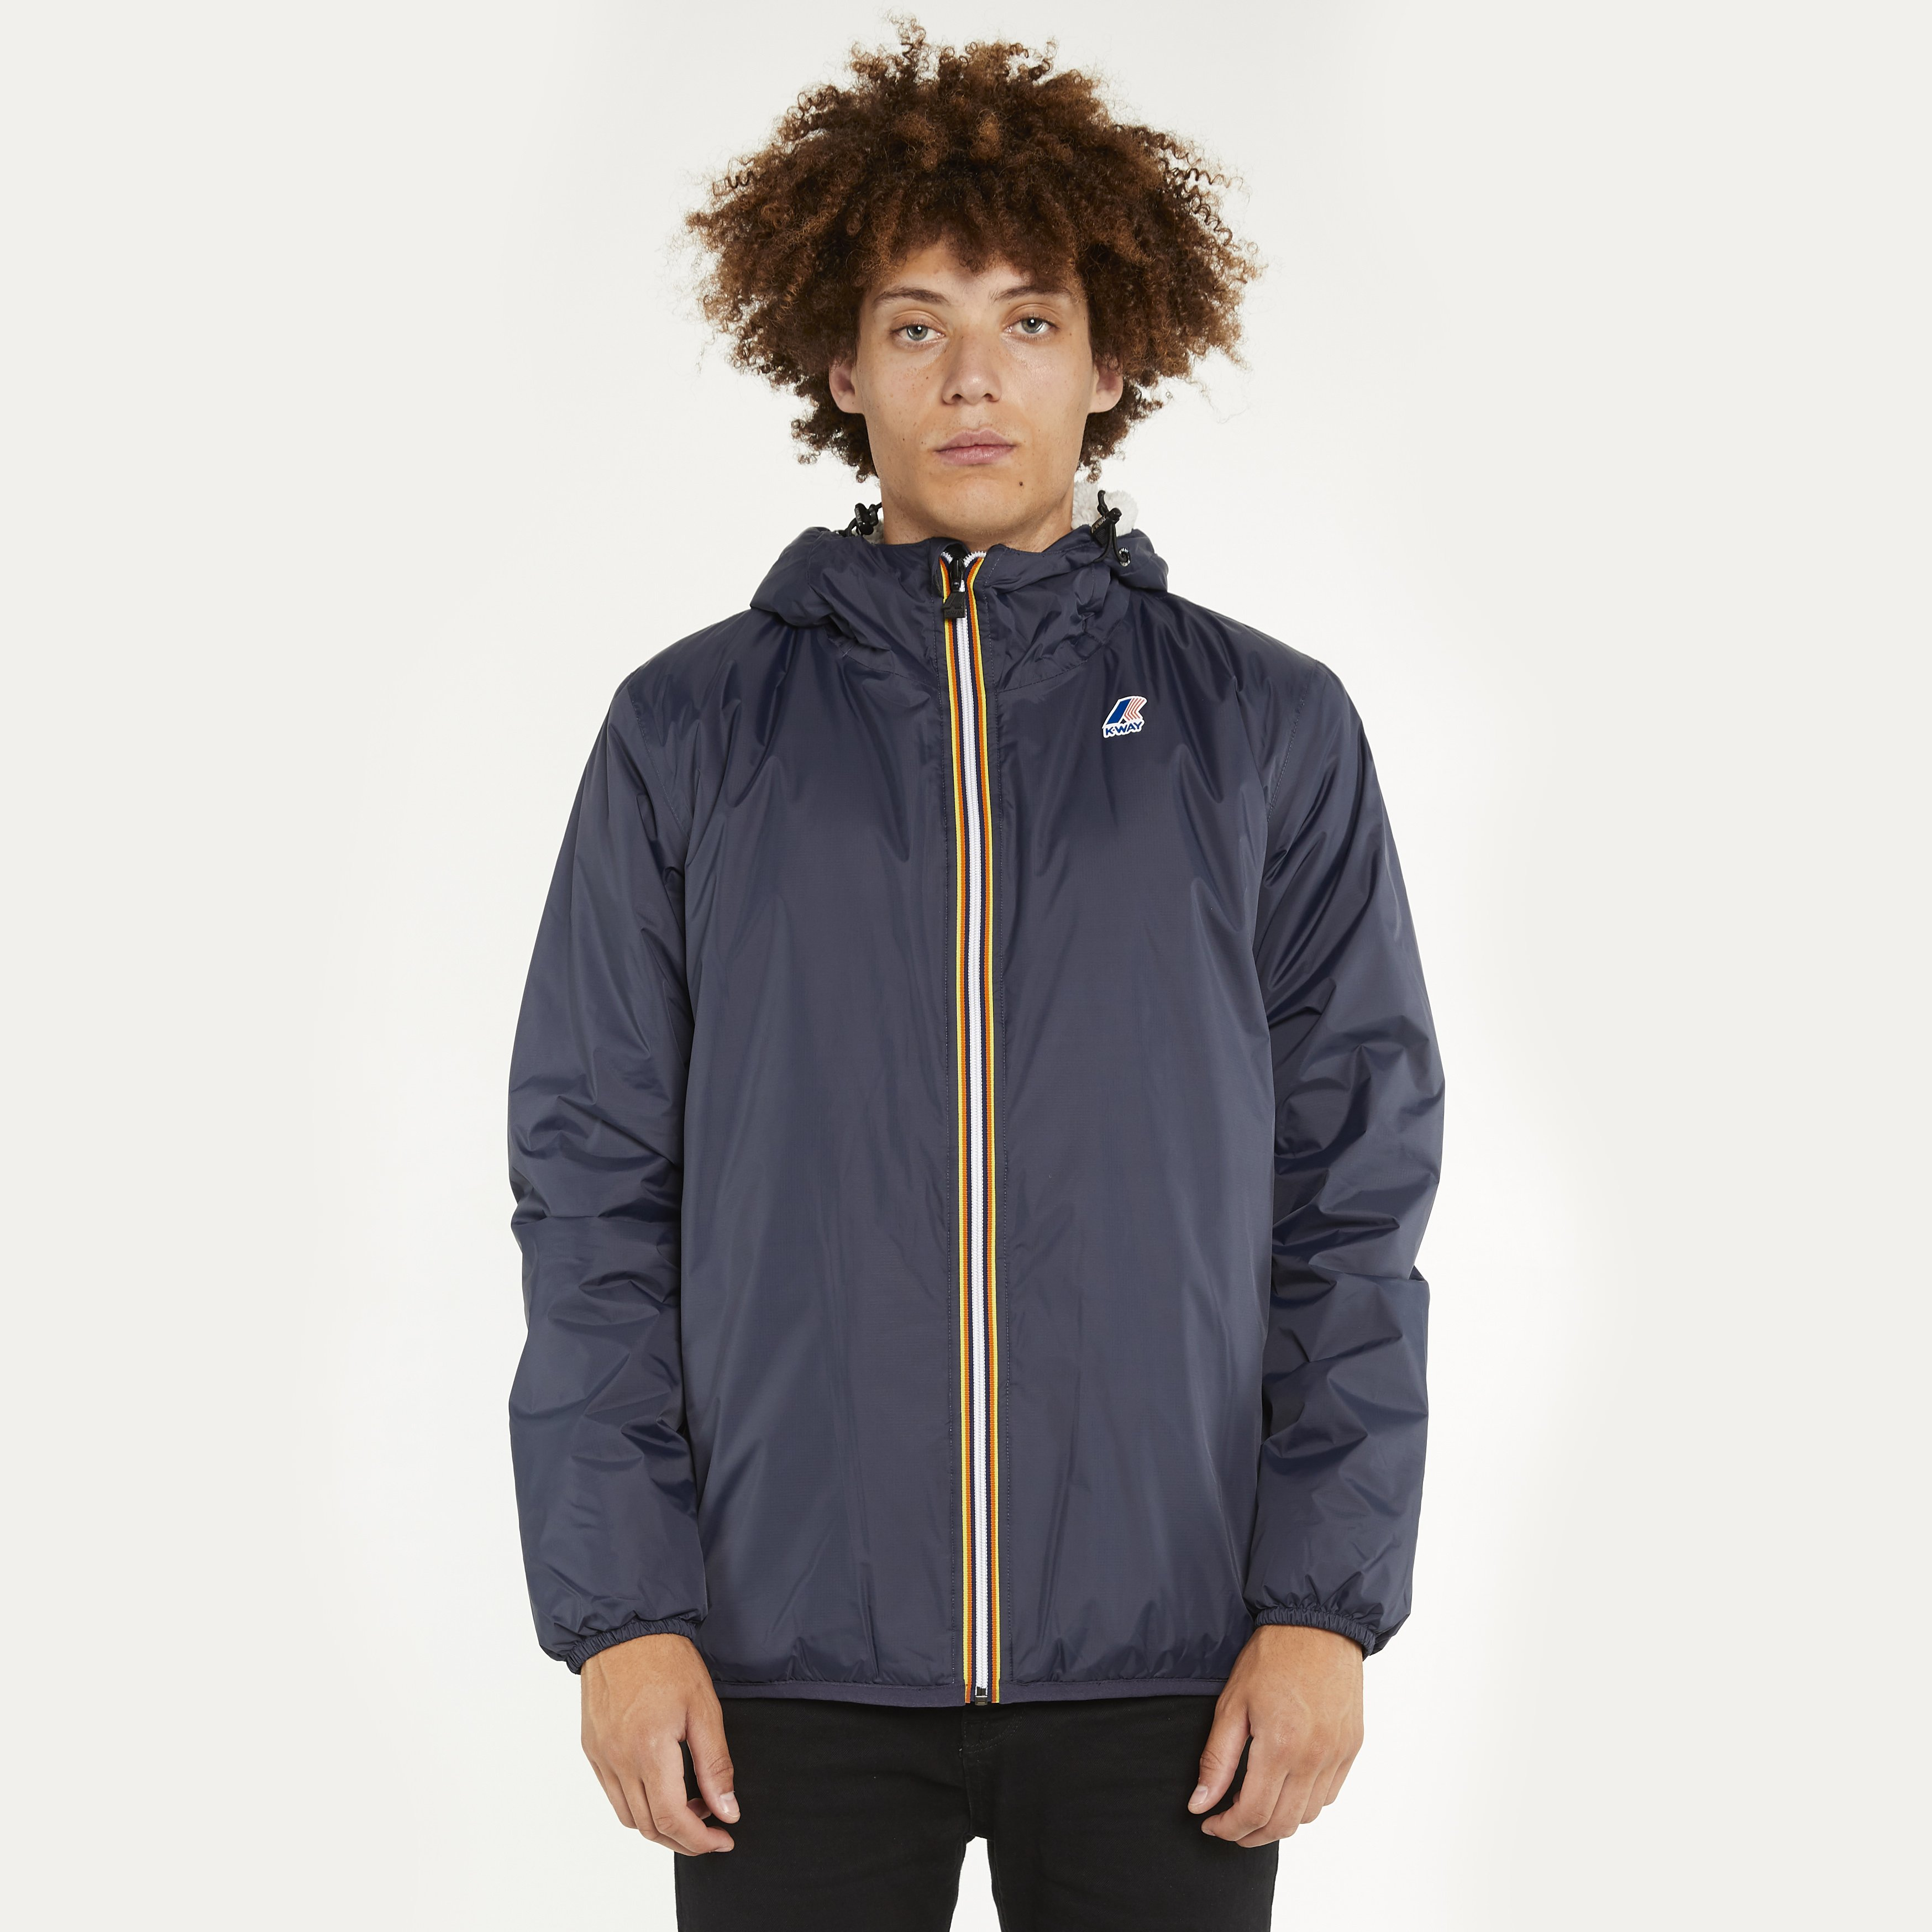 K-Way Le Vrai 3.0 Leon Padded Blue Depth Jacket